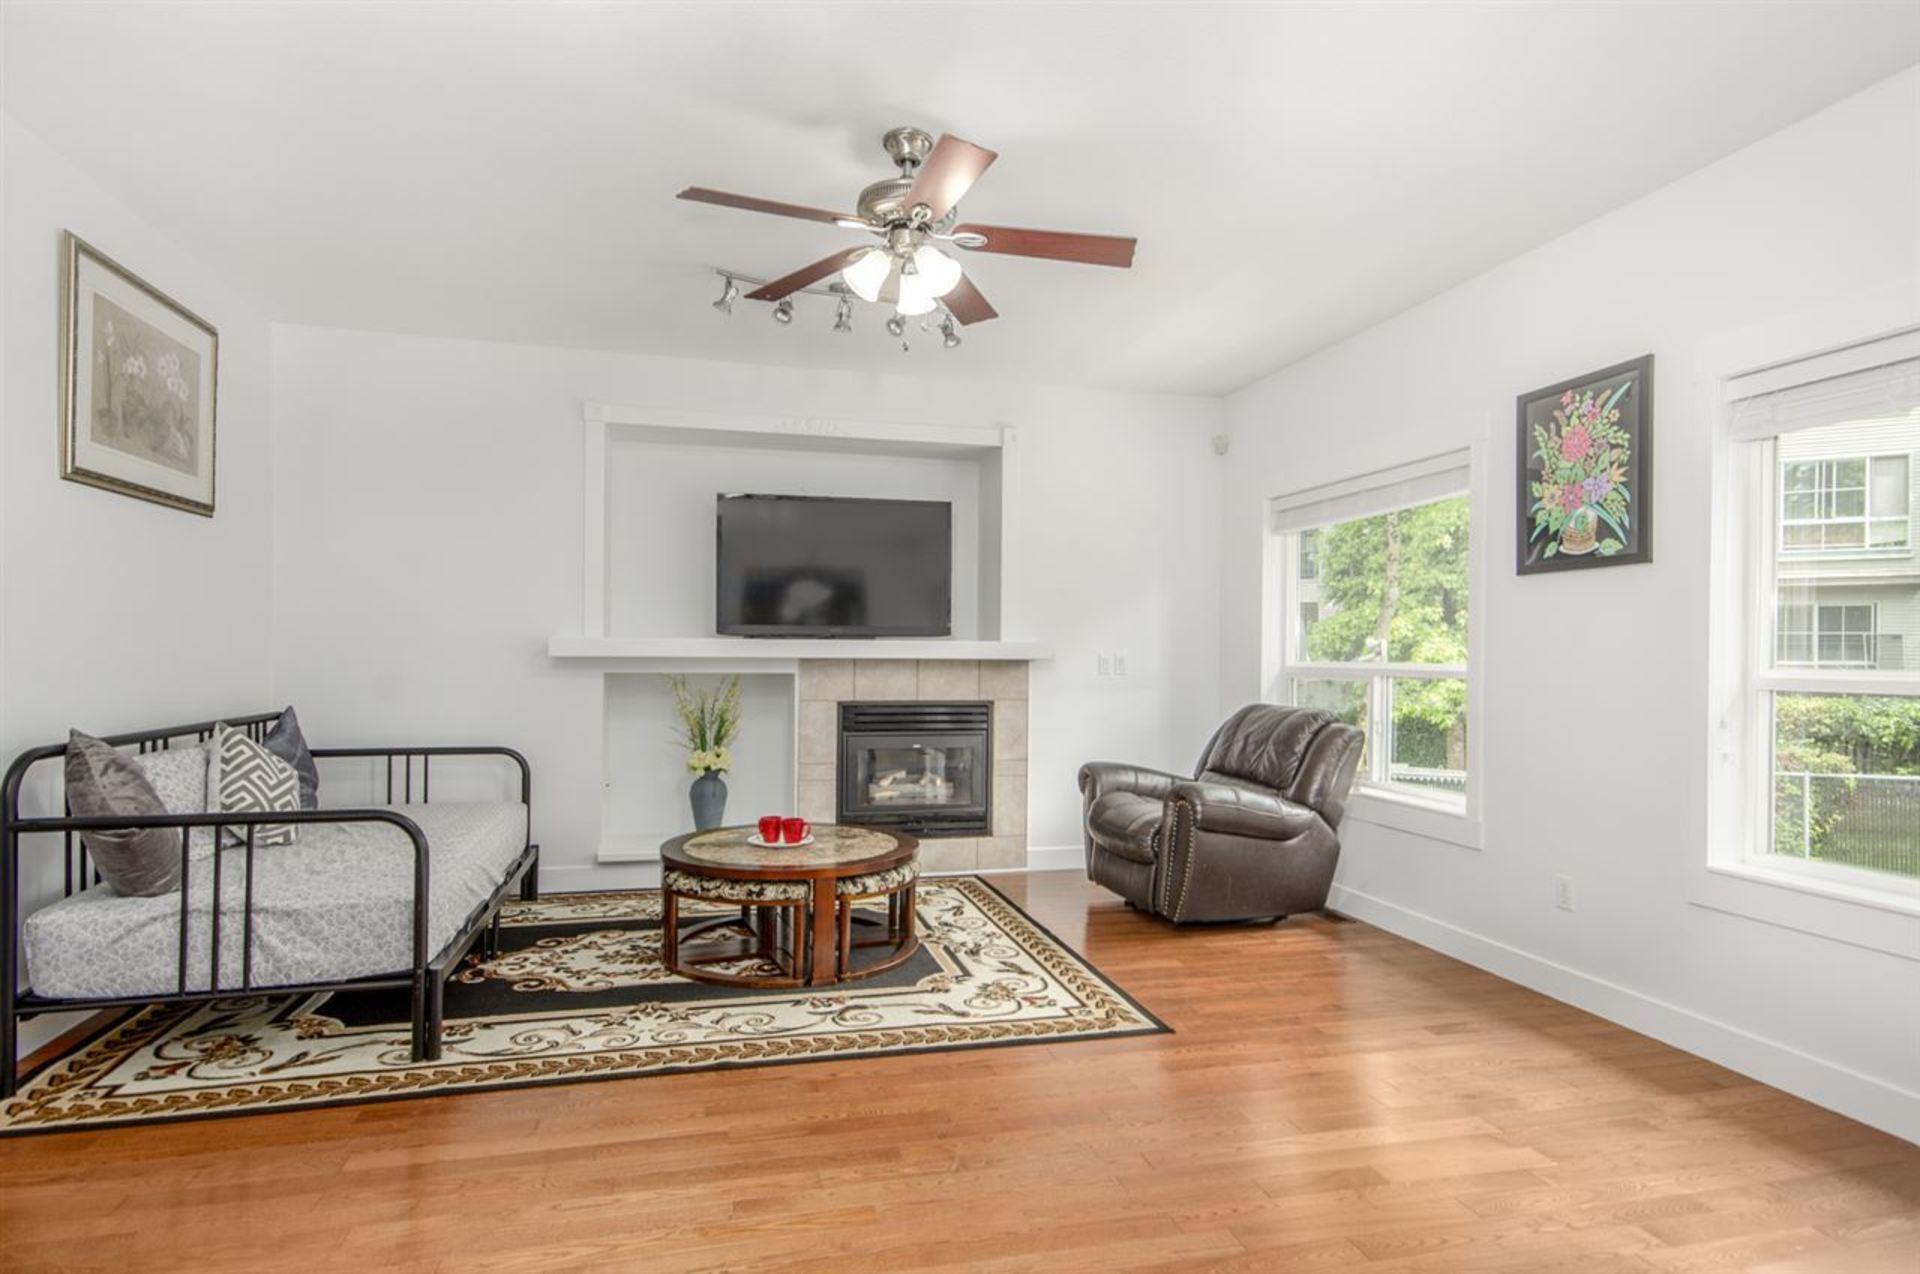 6110-195-street-cloverdale-bc-cloverdale-04 at 6110 195 Street, Cloverdale BC, Cloverdale